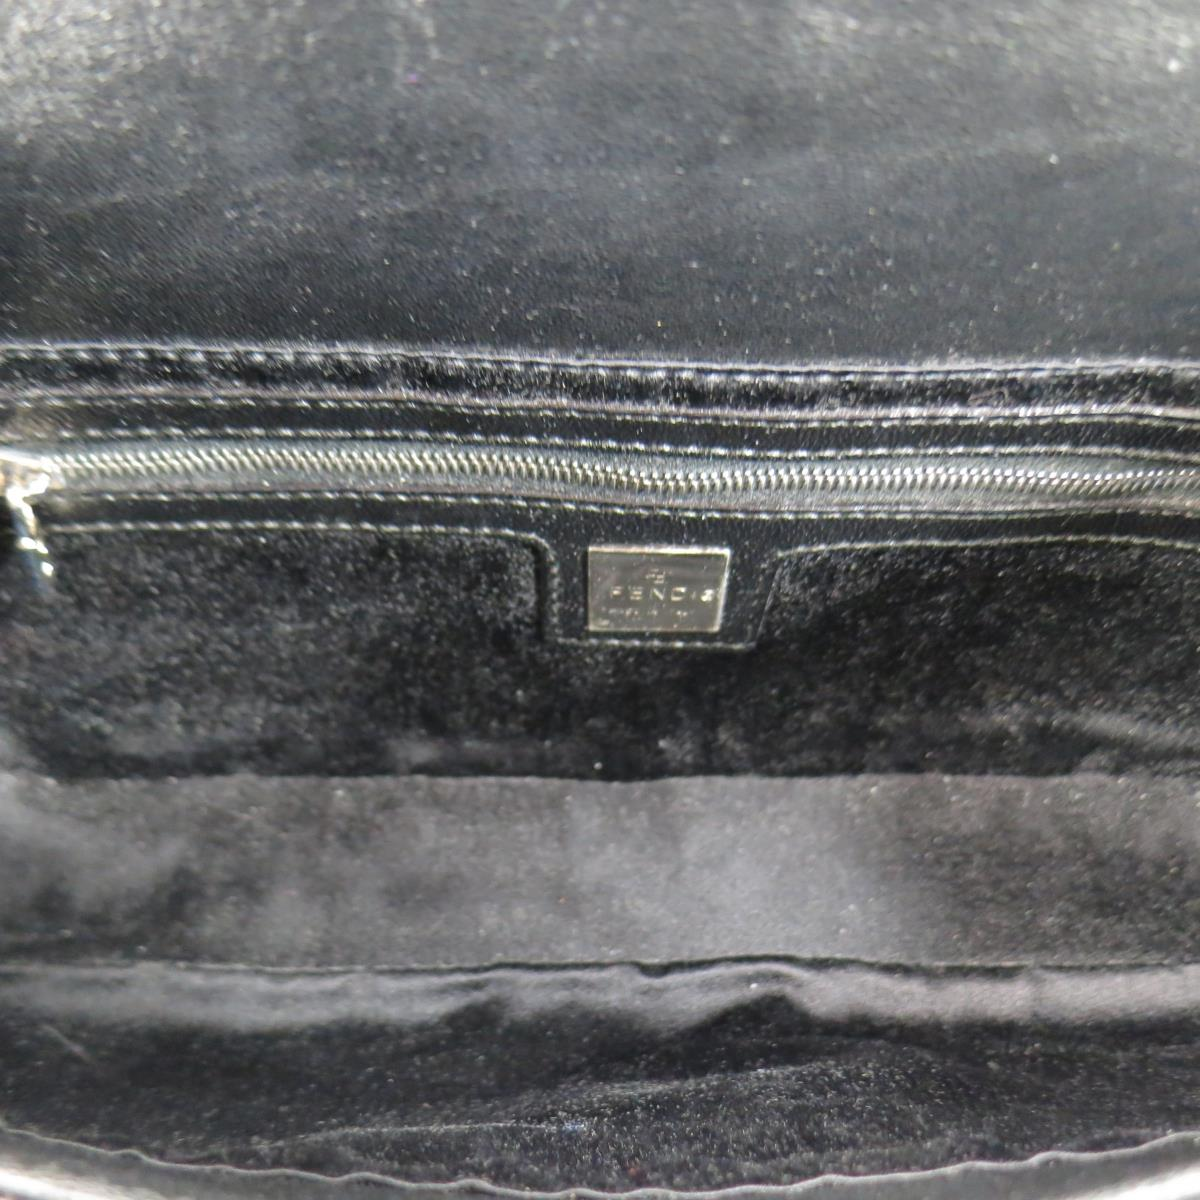 b6daba1cdbb5 Sui Generis Designer Consignment SAN FRANCISCO S FAVORITE DESIGNER  CONSIGNMENT STORES AND ONLINE SHOP. FENDI Black Leather Silver Enamel  Buckle Handbag